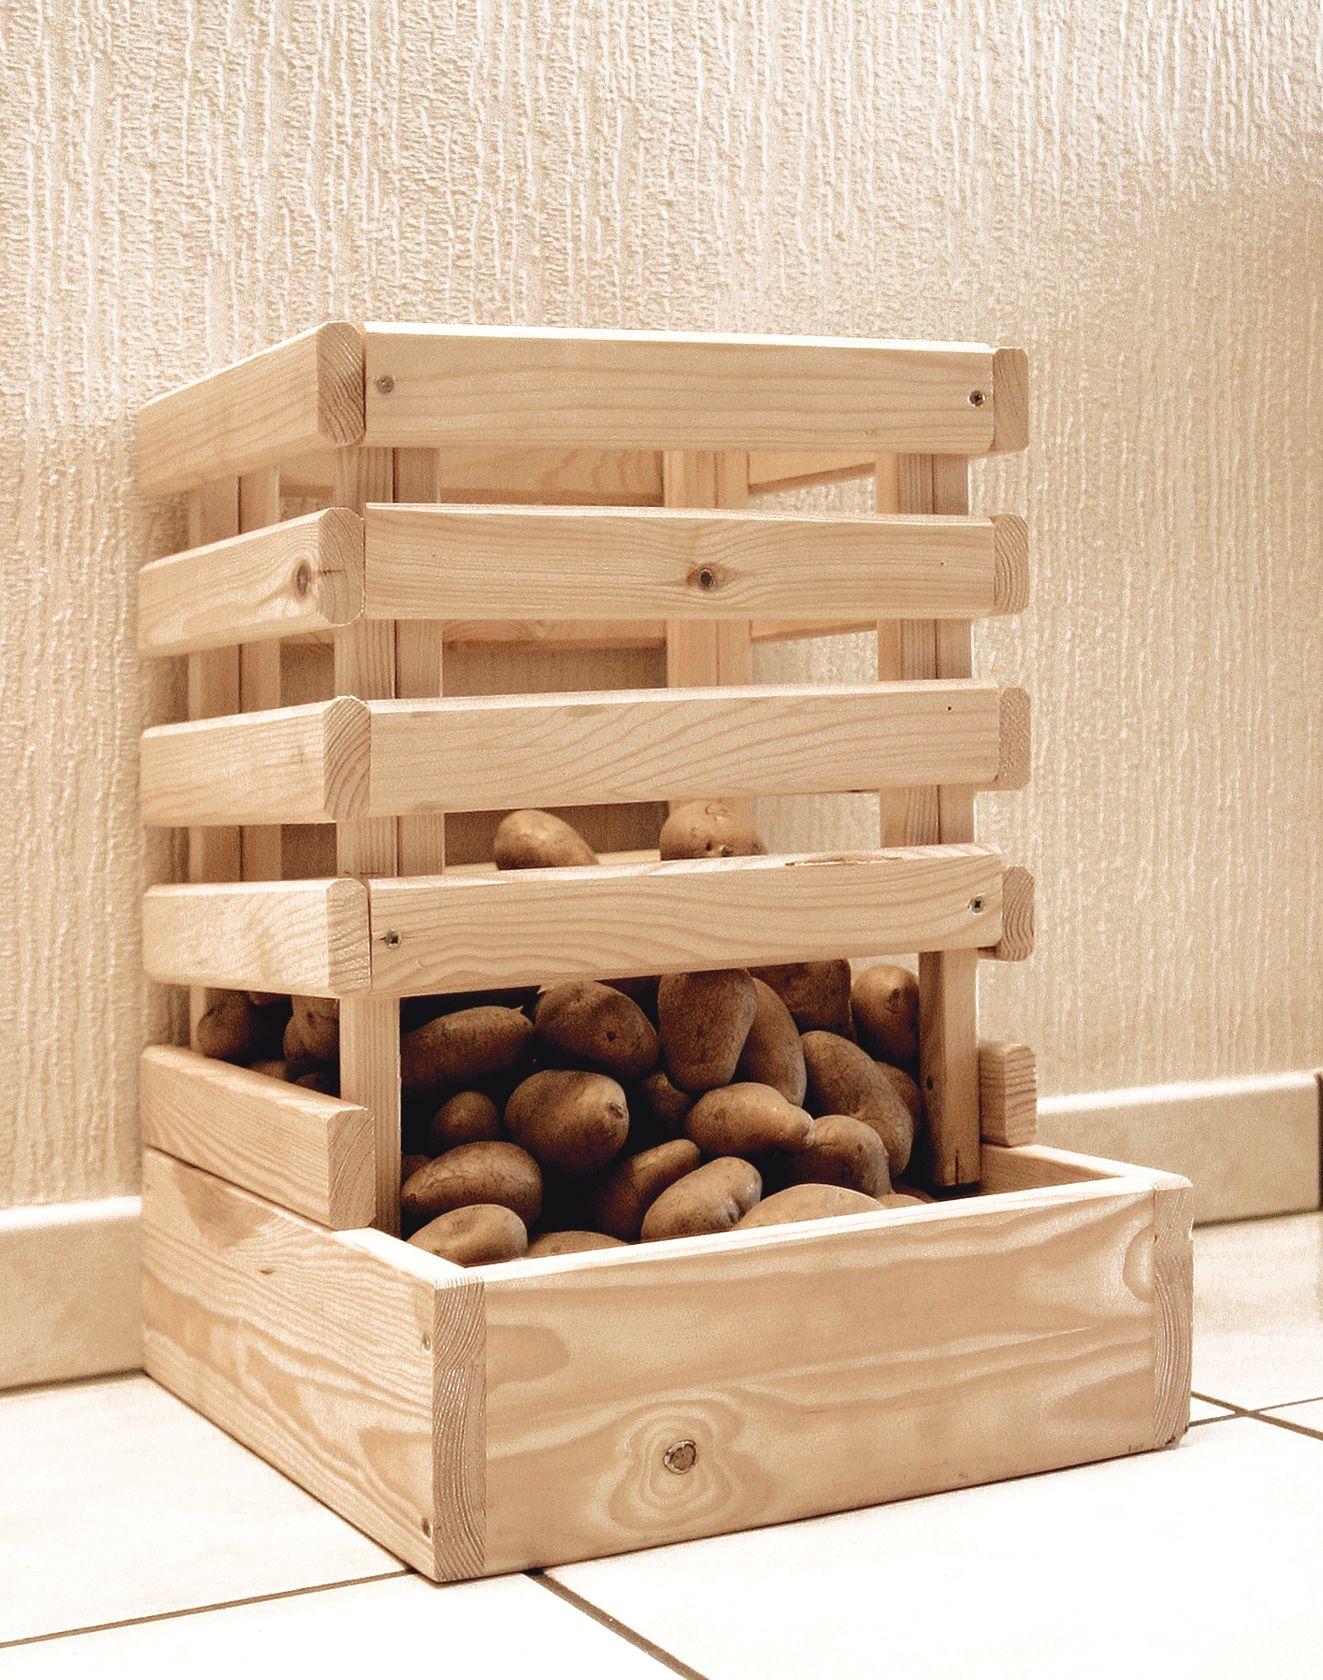 Kartoffelkiste Ca 30 X 42 X 46 5 Cm Kartoffelkiste Apfelkiste